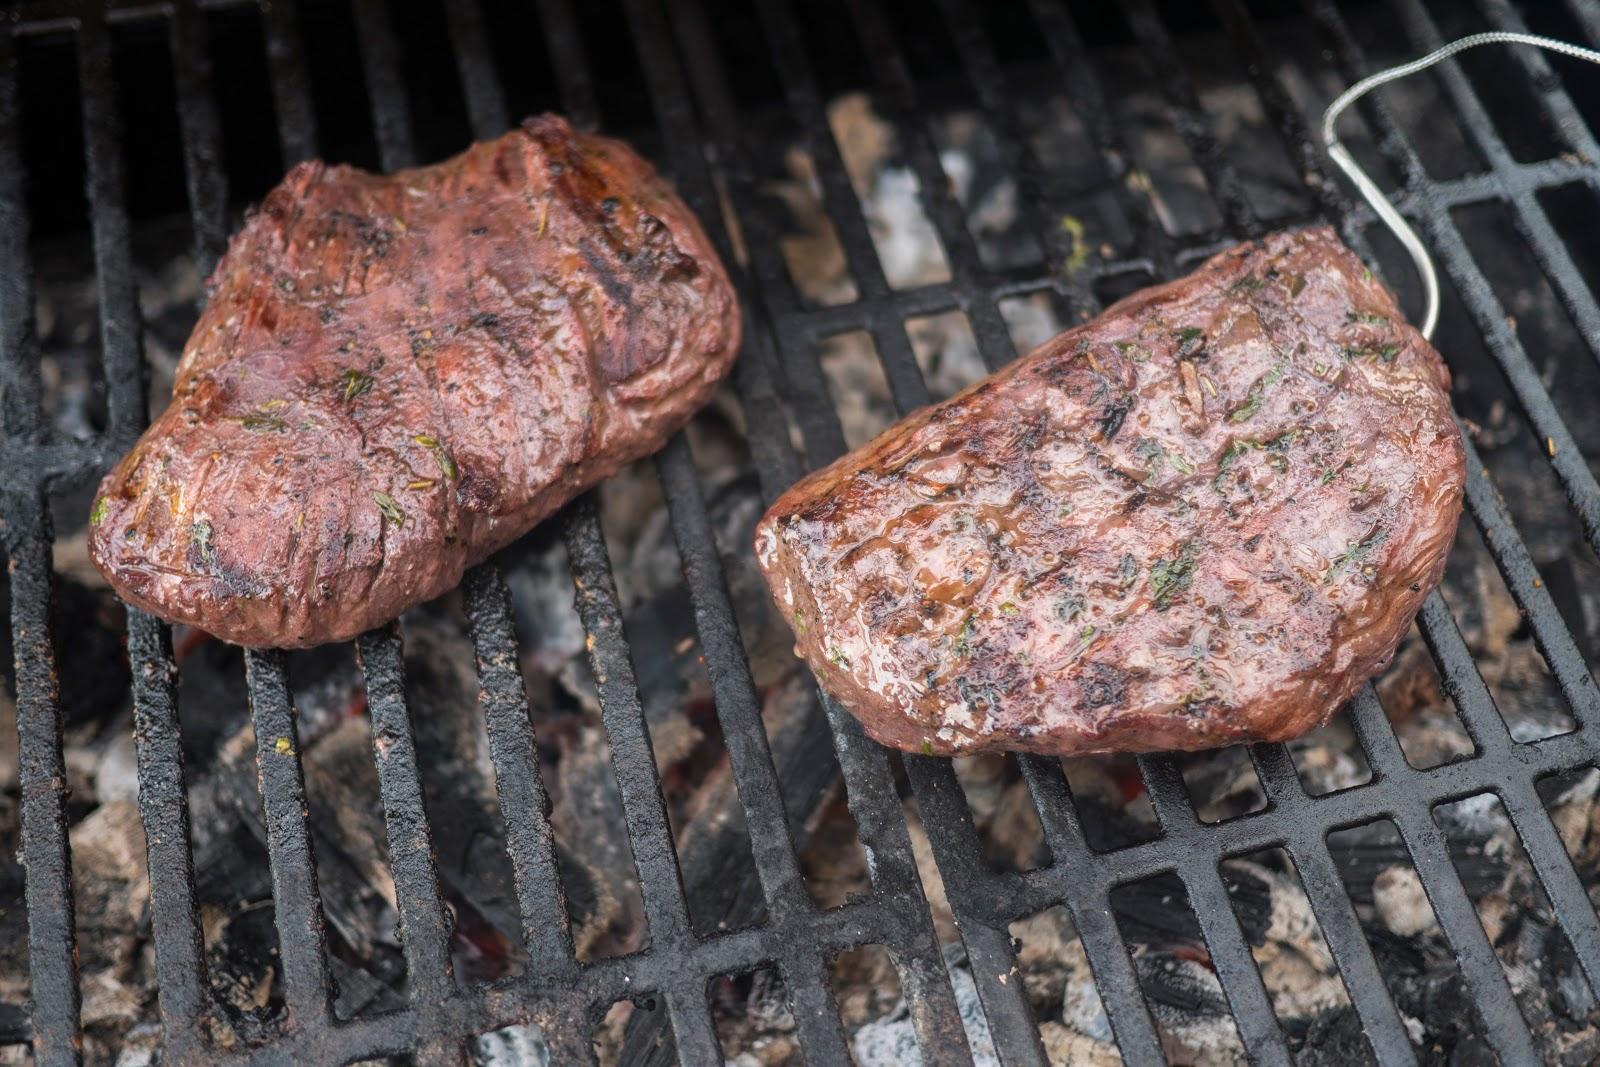 flank_steak_grillissa25cc2588_1-1